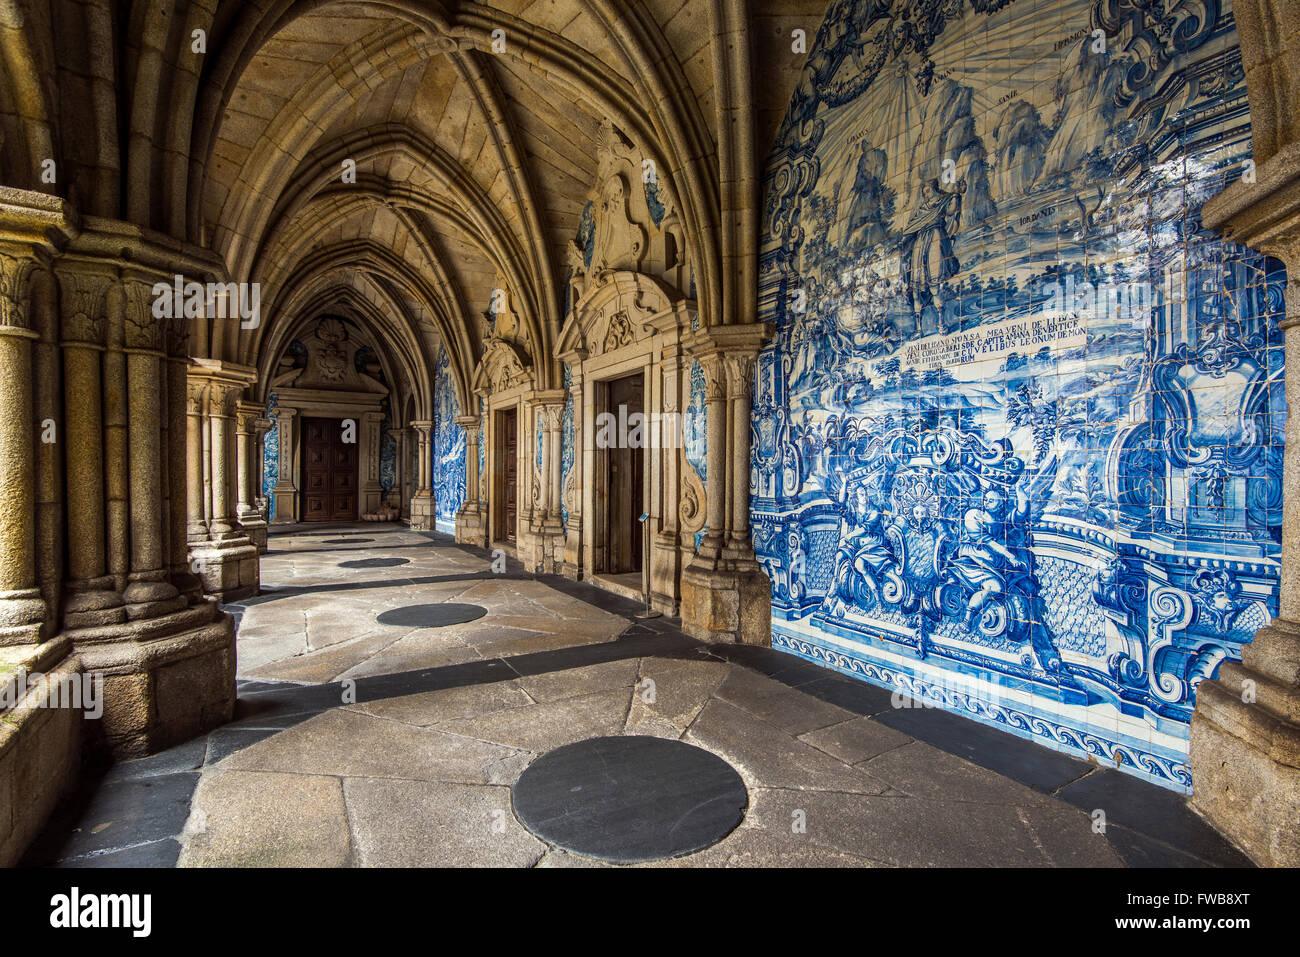 The 14th Gothic cloister with azulejos tilework, Porto Cathedral or Se do Porto, Porto, Portugal - Stock Image